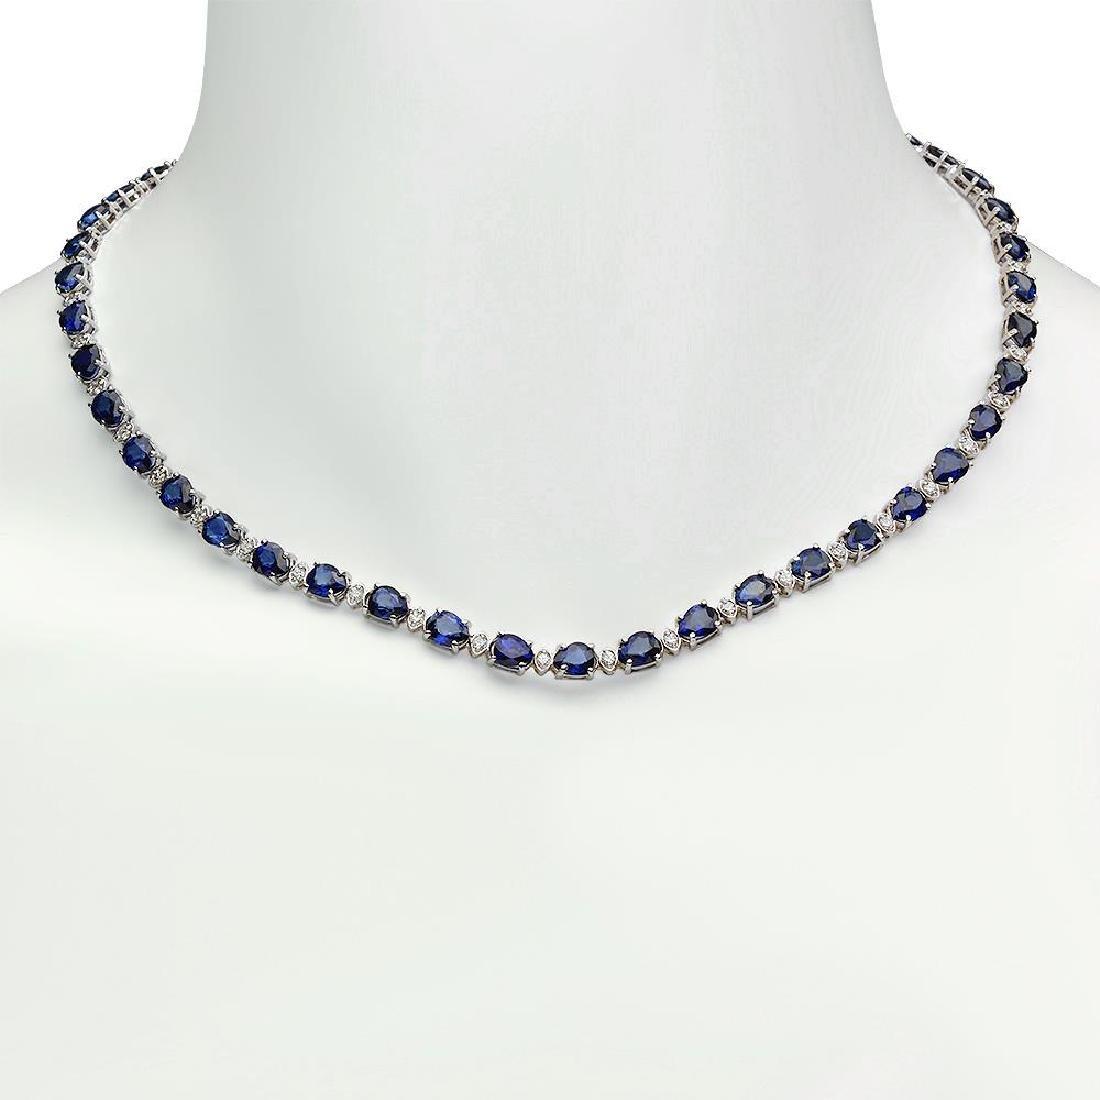 14K Gold 31.39ct Sapphire 1.52ct Diamond Necklace